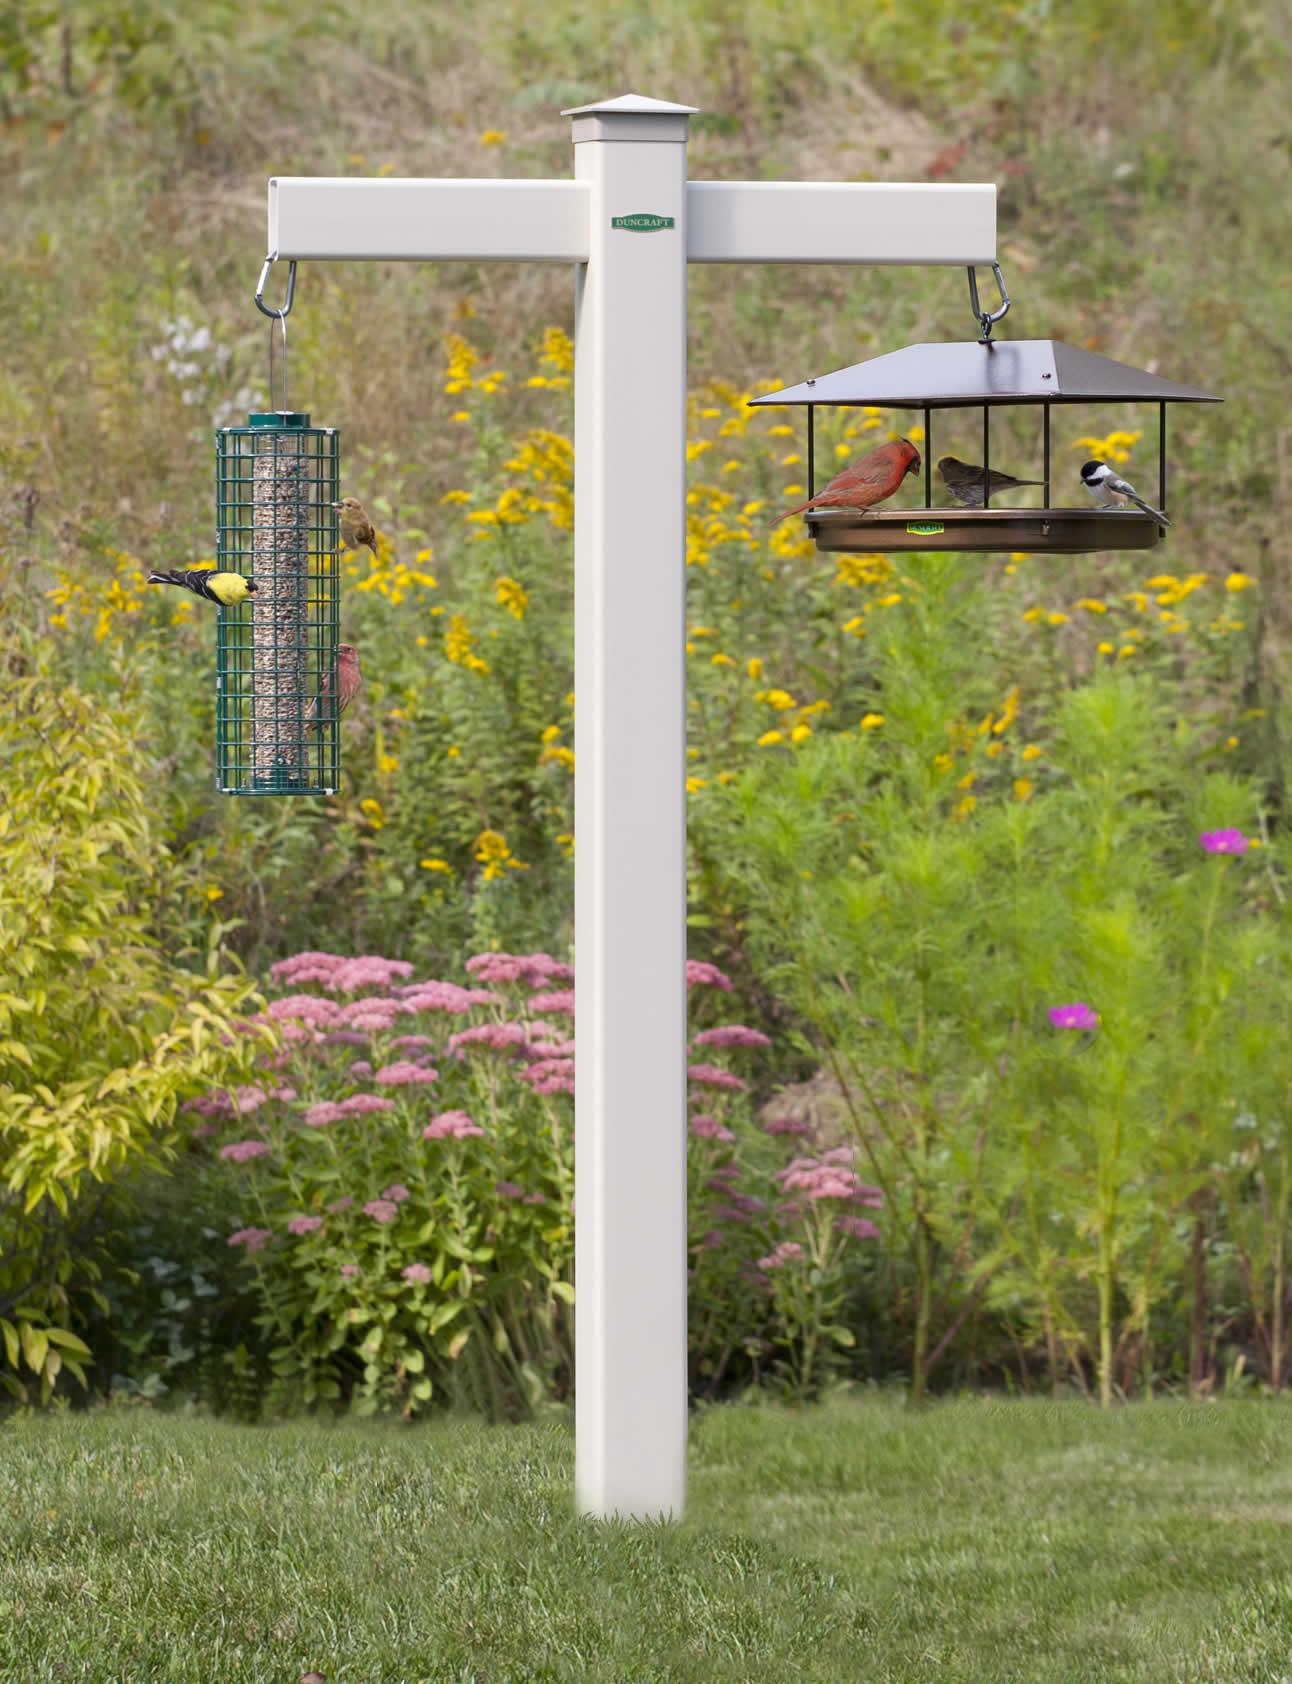 rail by hooks download feeder decks hangers bird deck hanger plant hook planter for metal